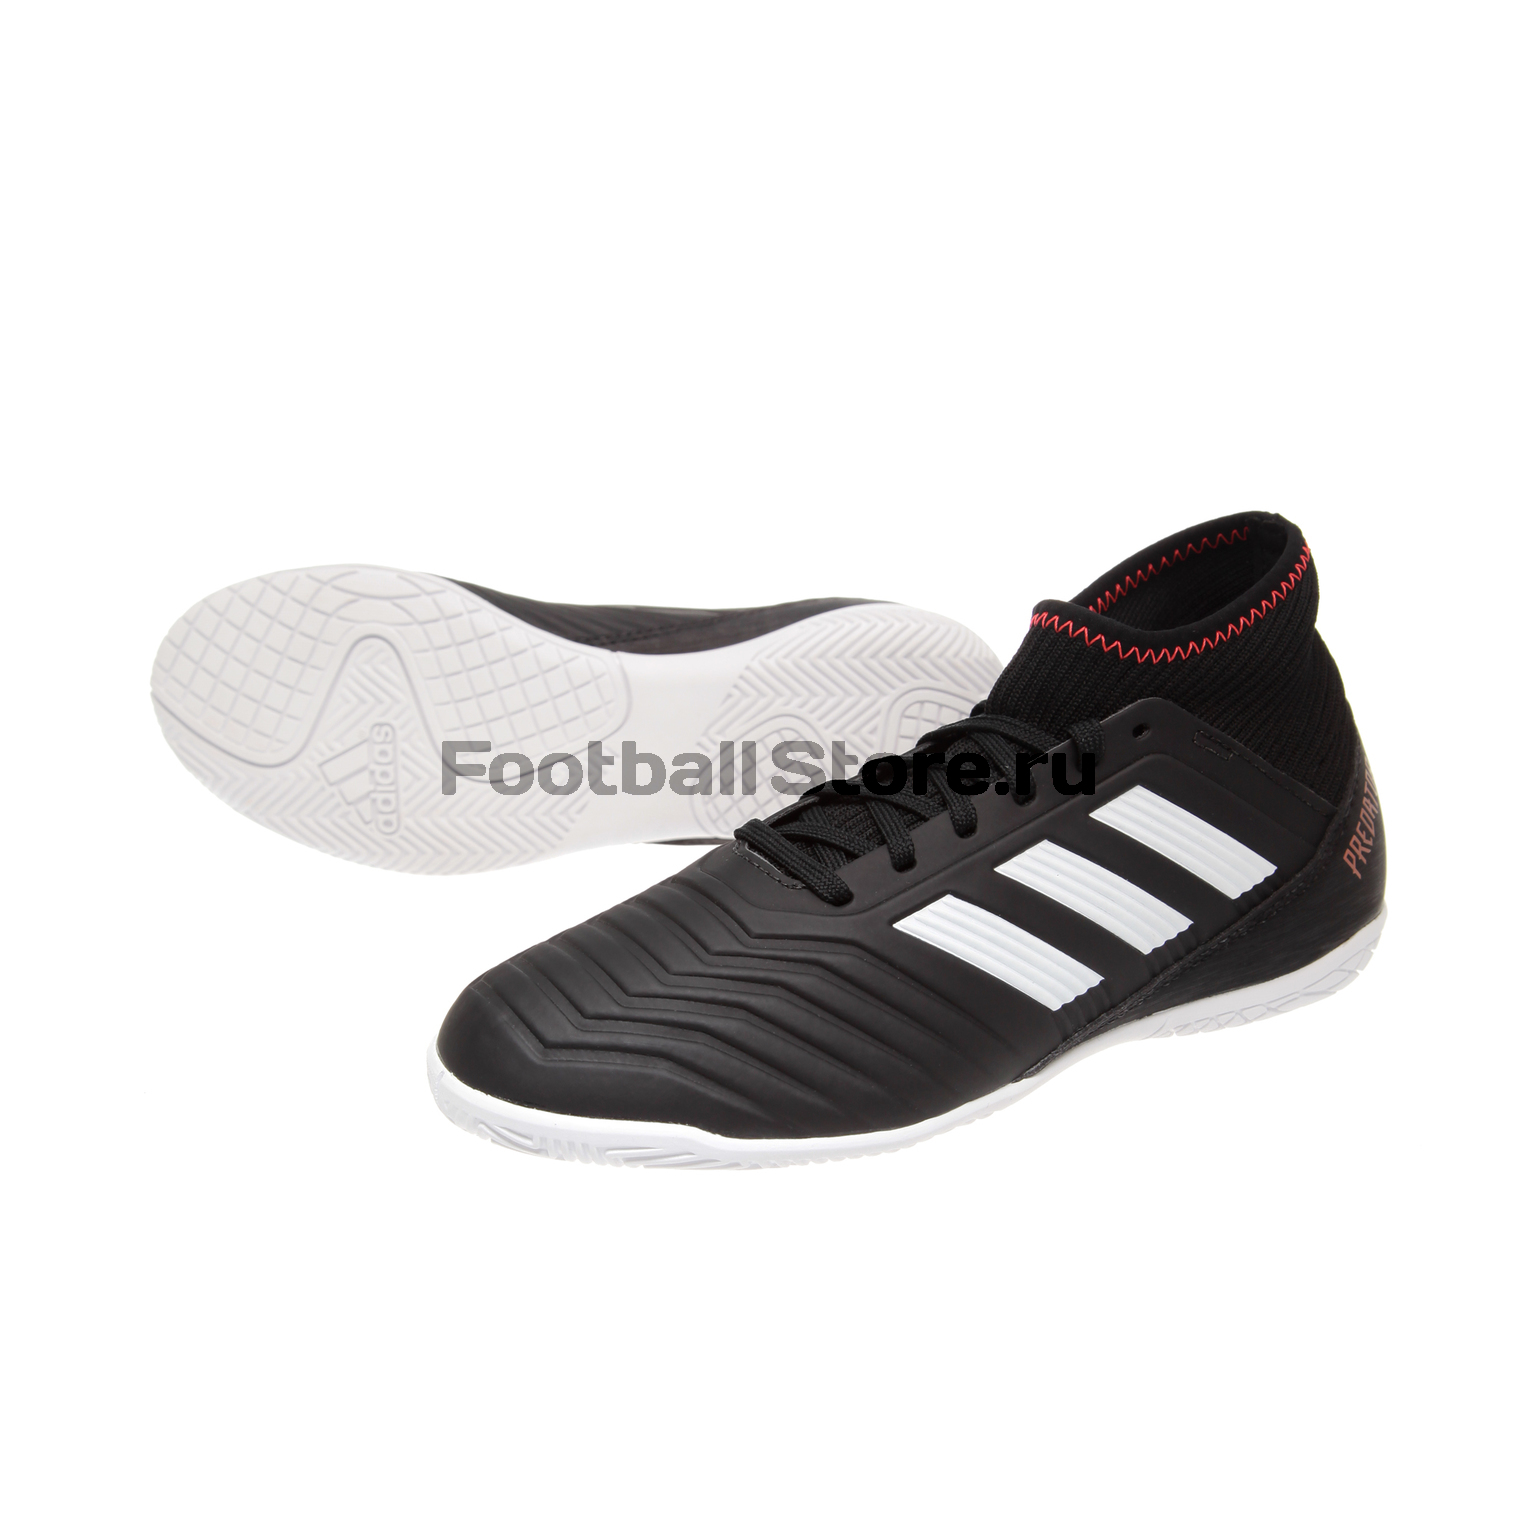 Обувь для зала Adidas Predator Tango 18.3 IN JR CP9076 обувь для зала adidas ace tango 18 3 in jr cp9075